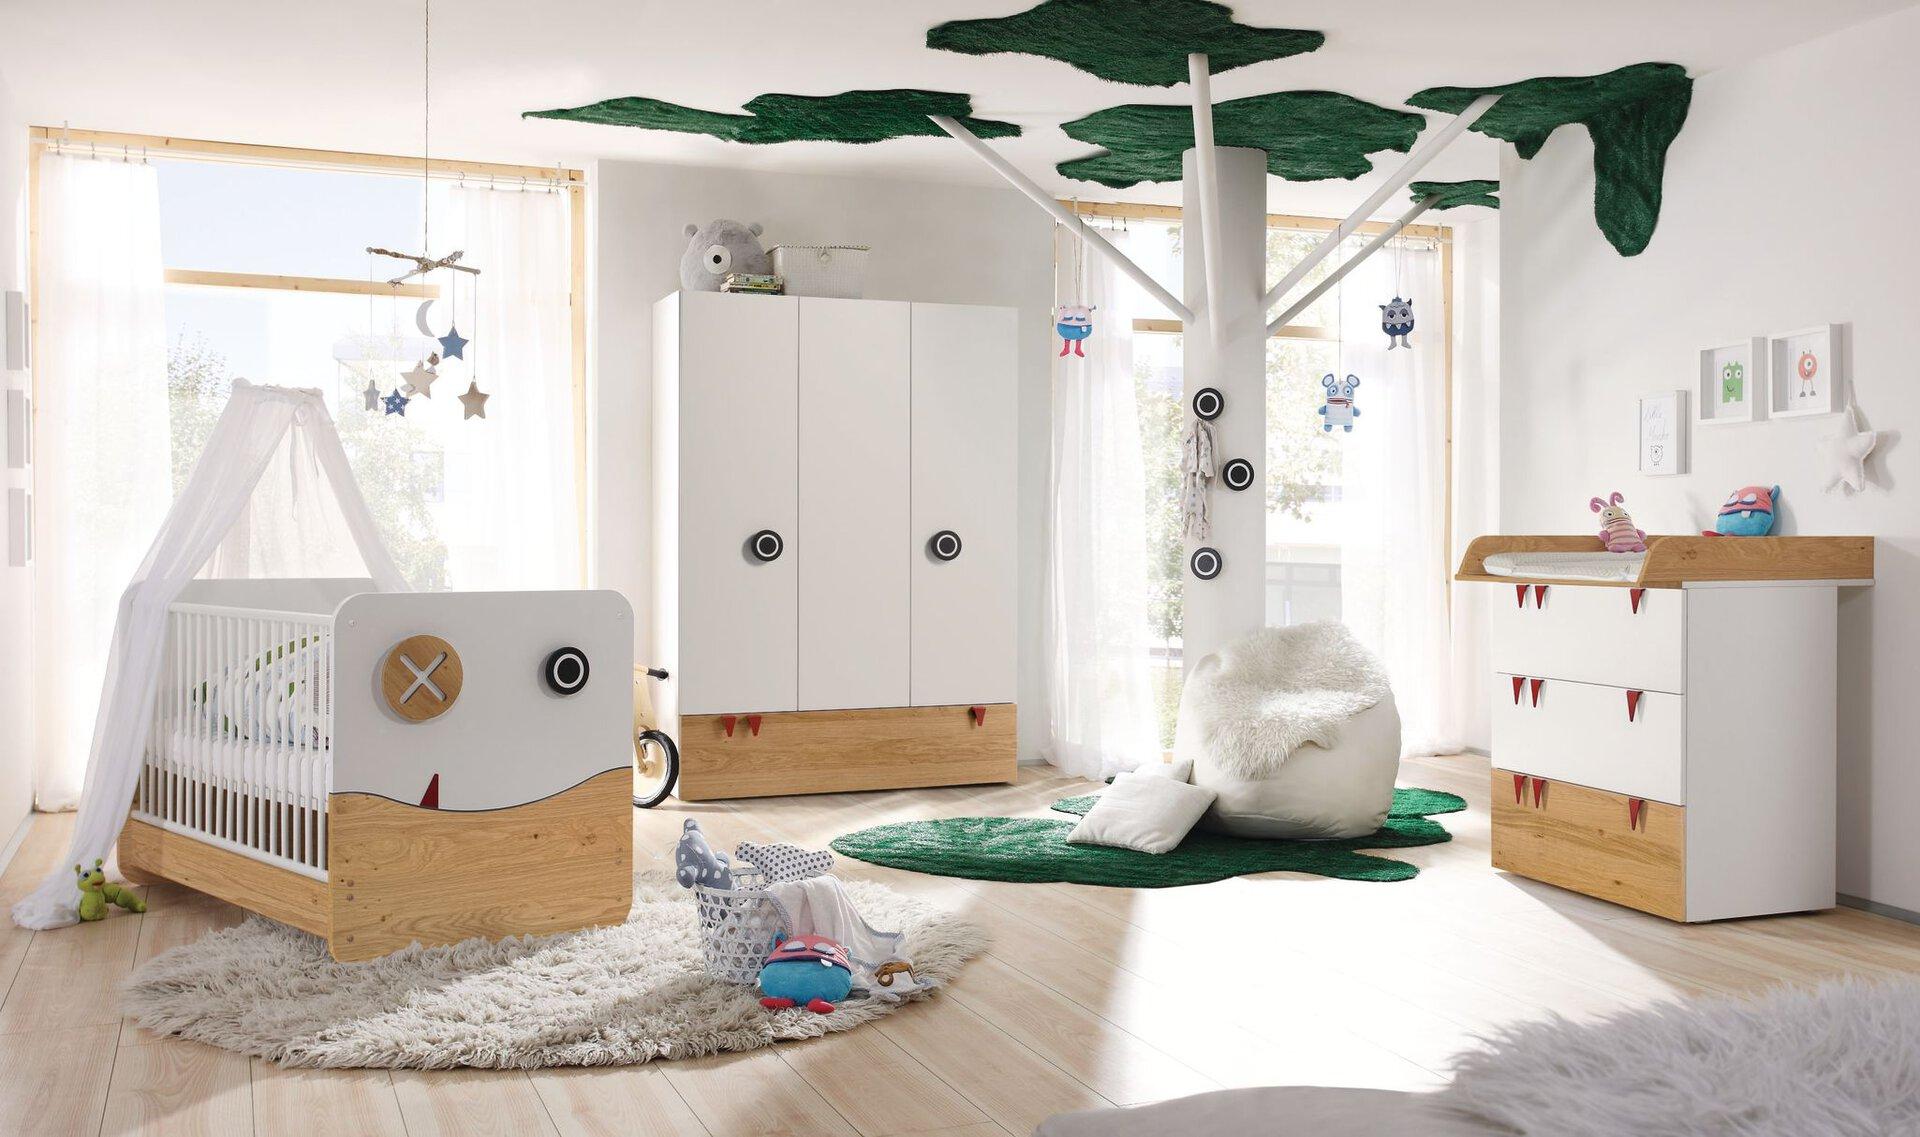 Babyzimmer MINIMO now! by Hülsta Holzwerkstoff 53 x 192 x 135 cm